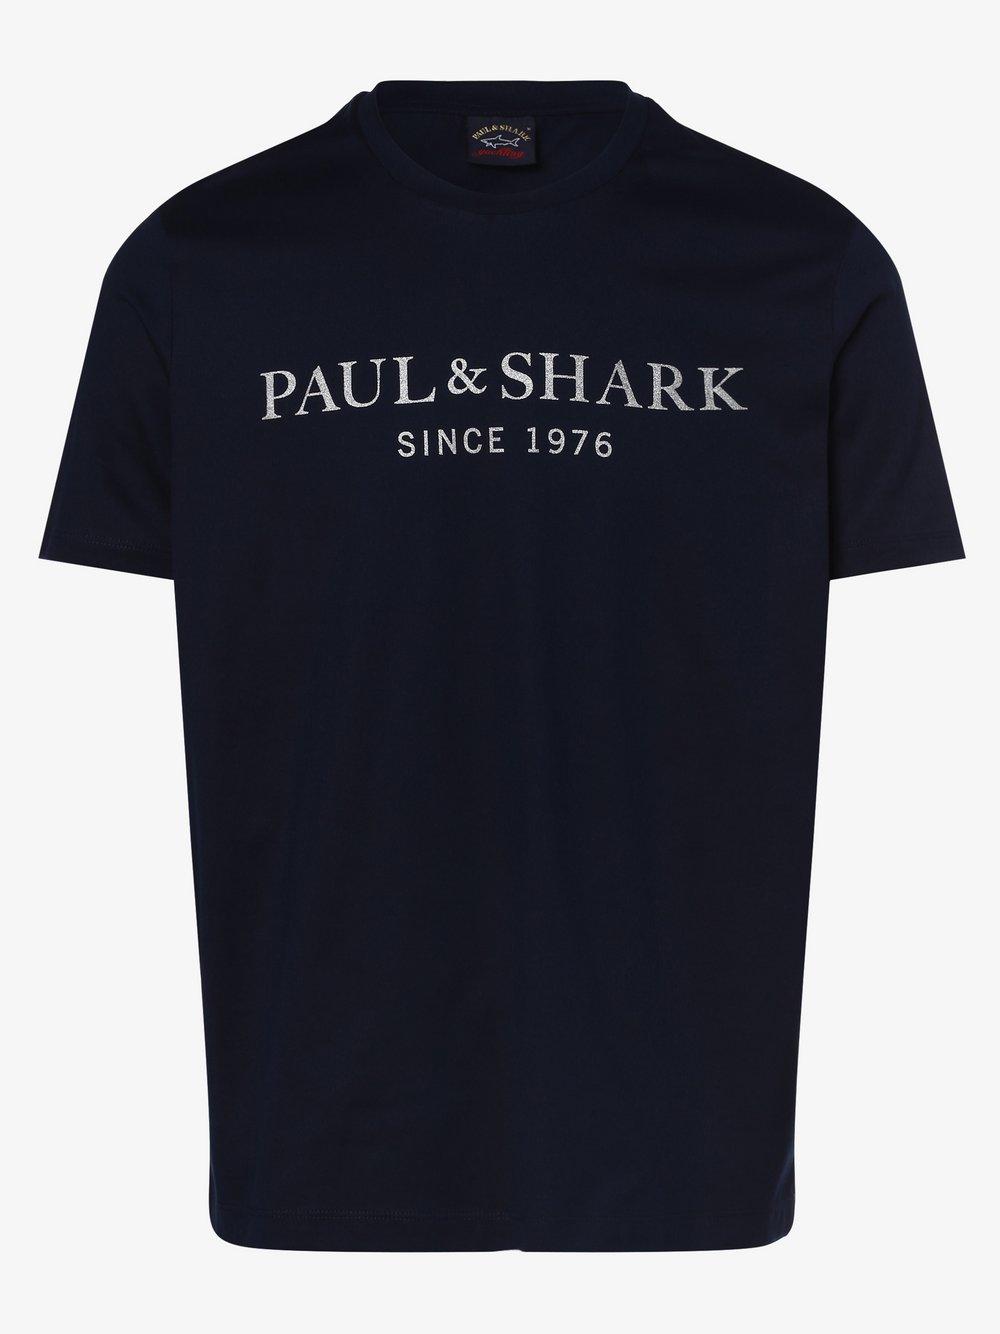 Paul & Shark - T-shirt męski, niebieski